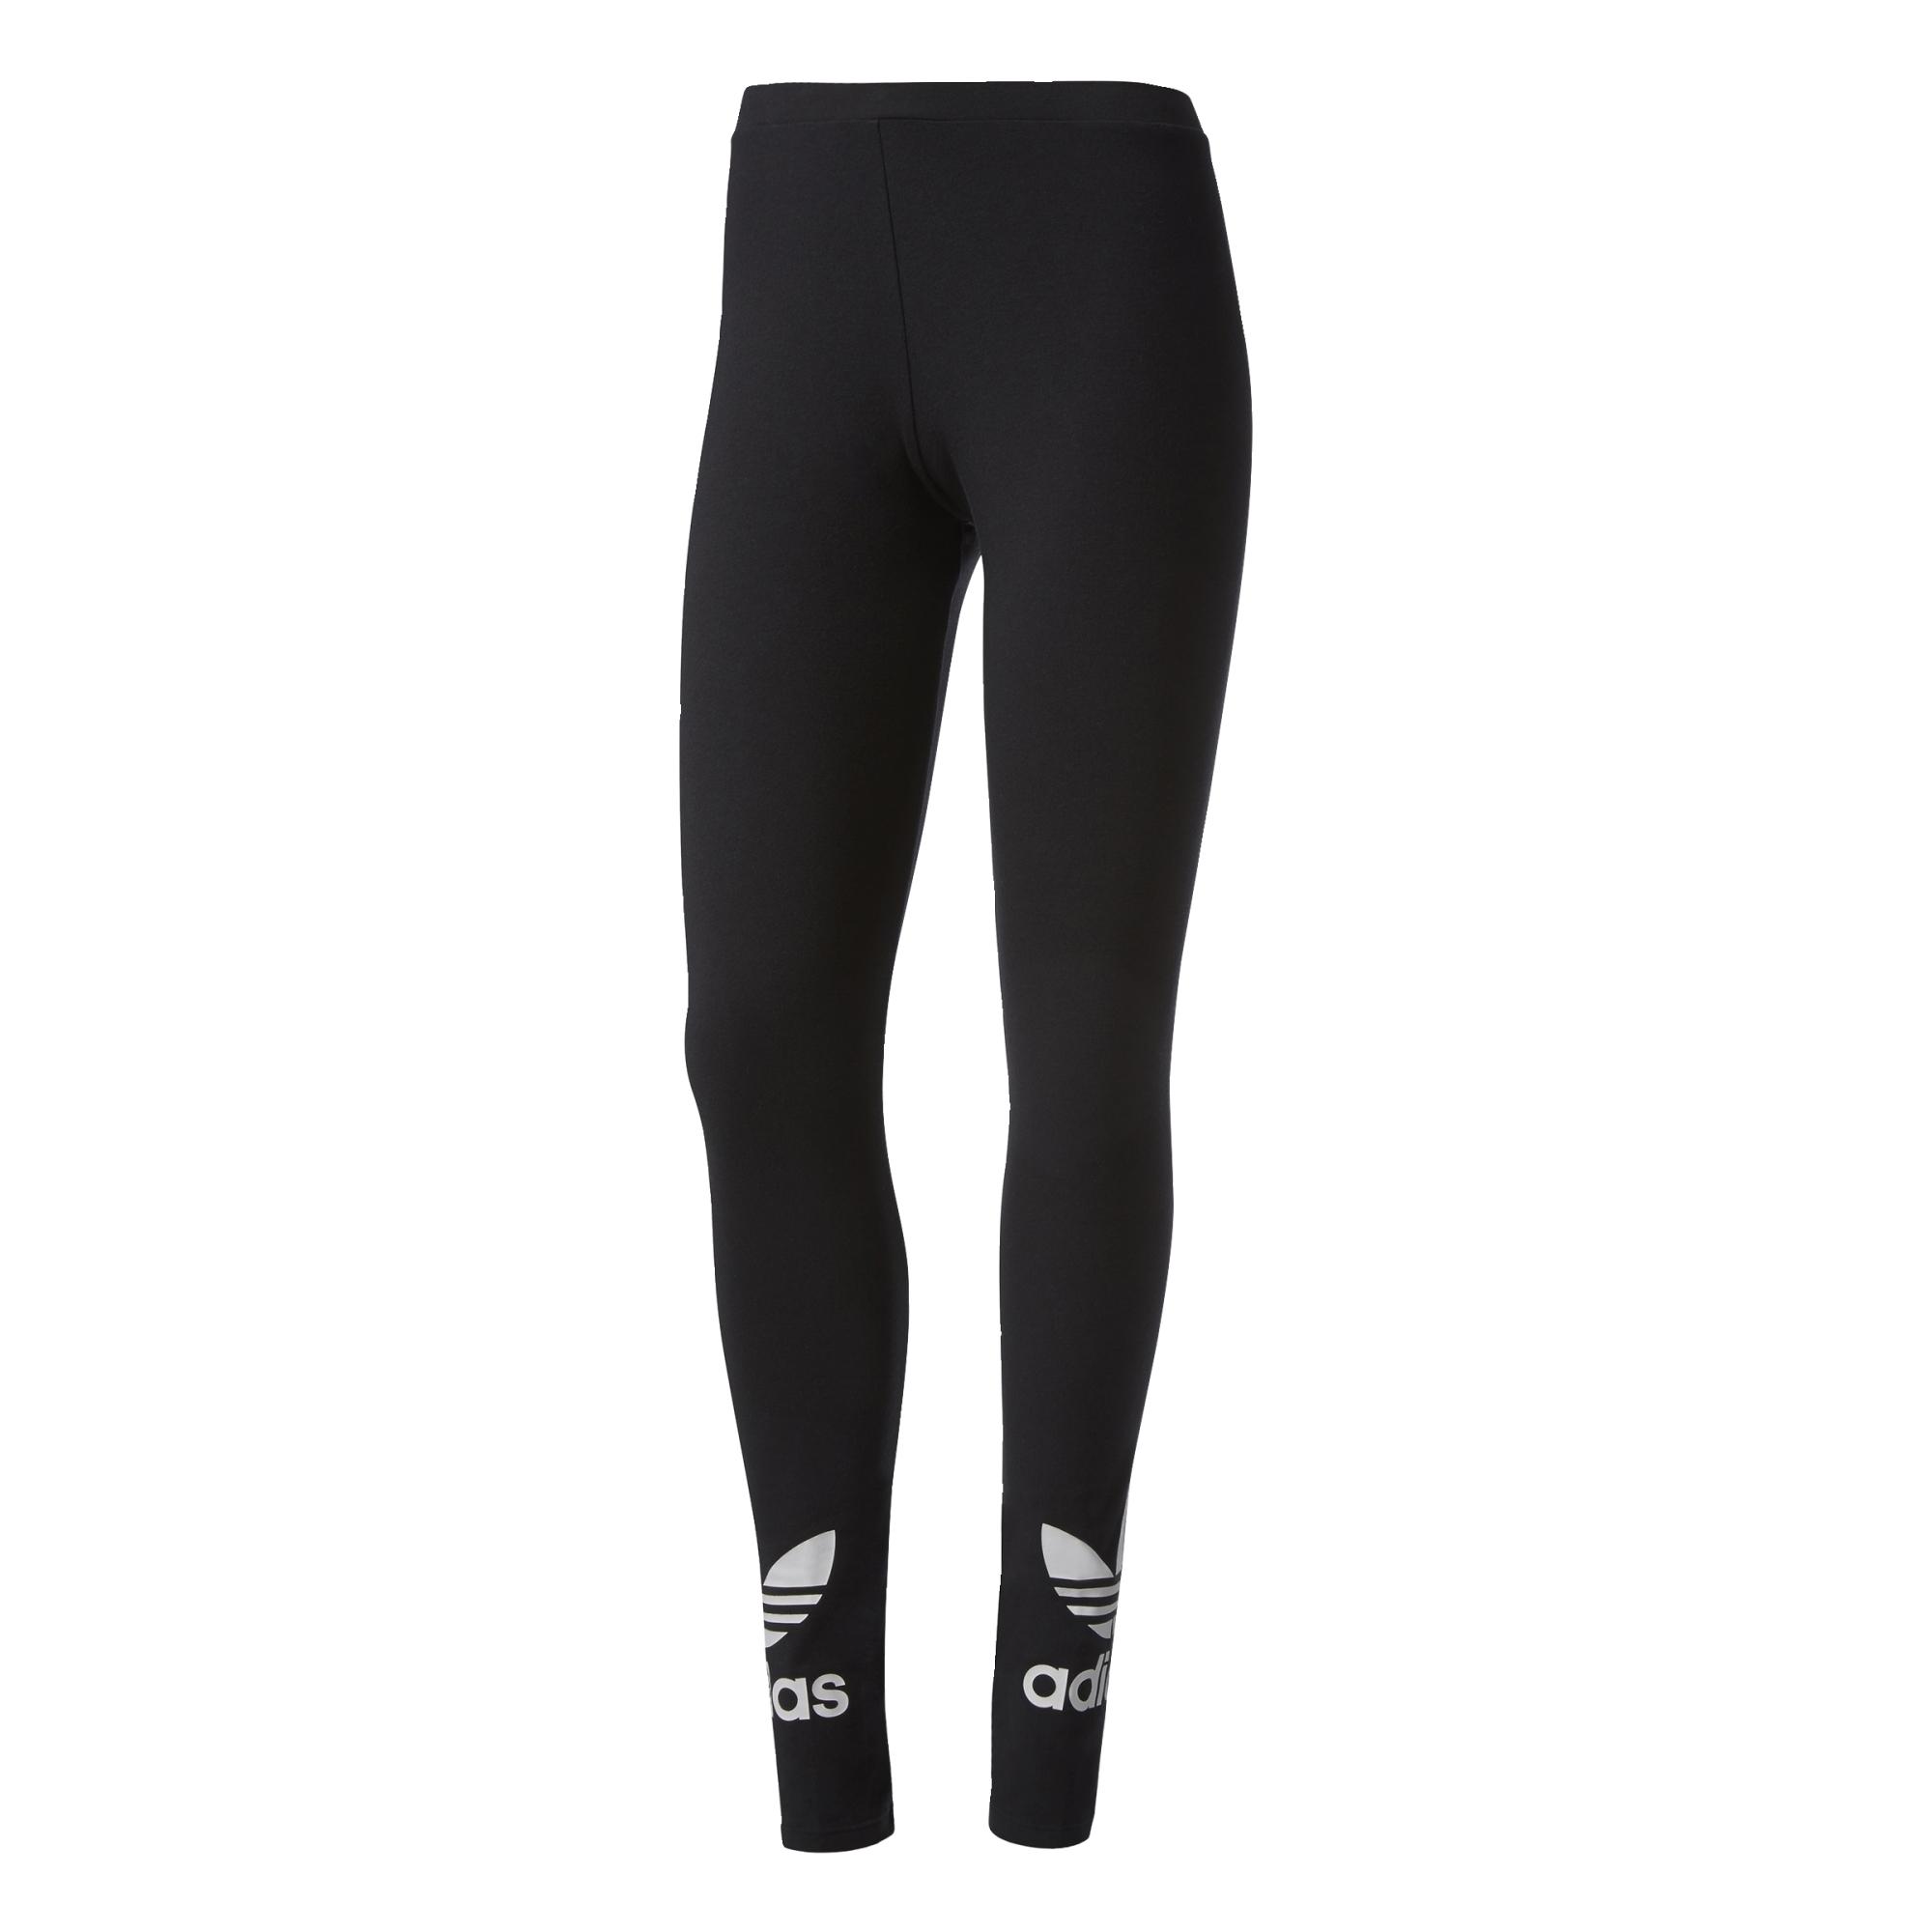 Adidas Originals Trefoil Leggings (black white) 941dba6ed310a